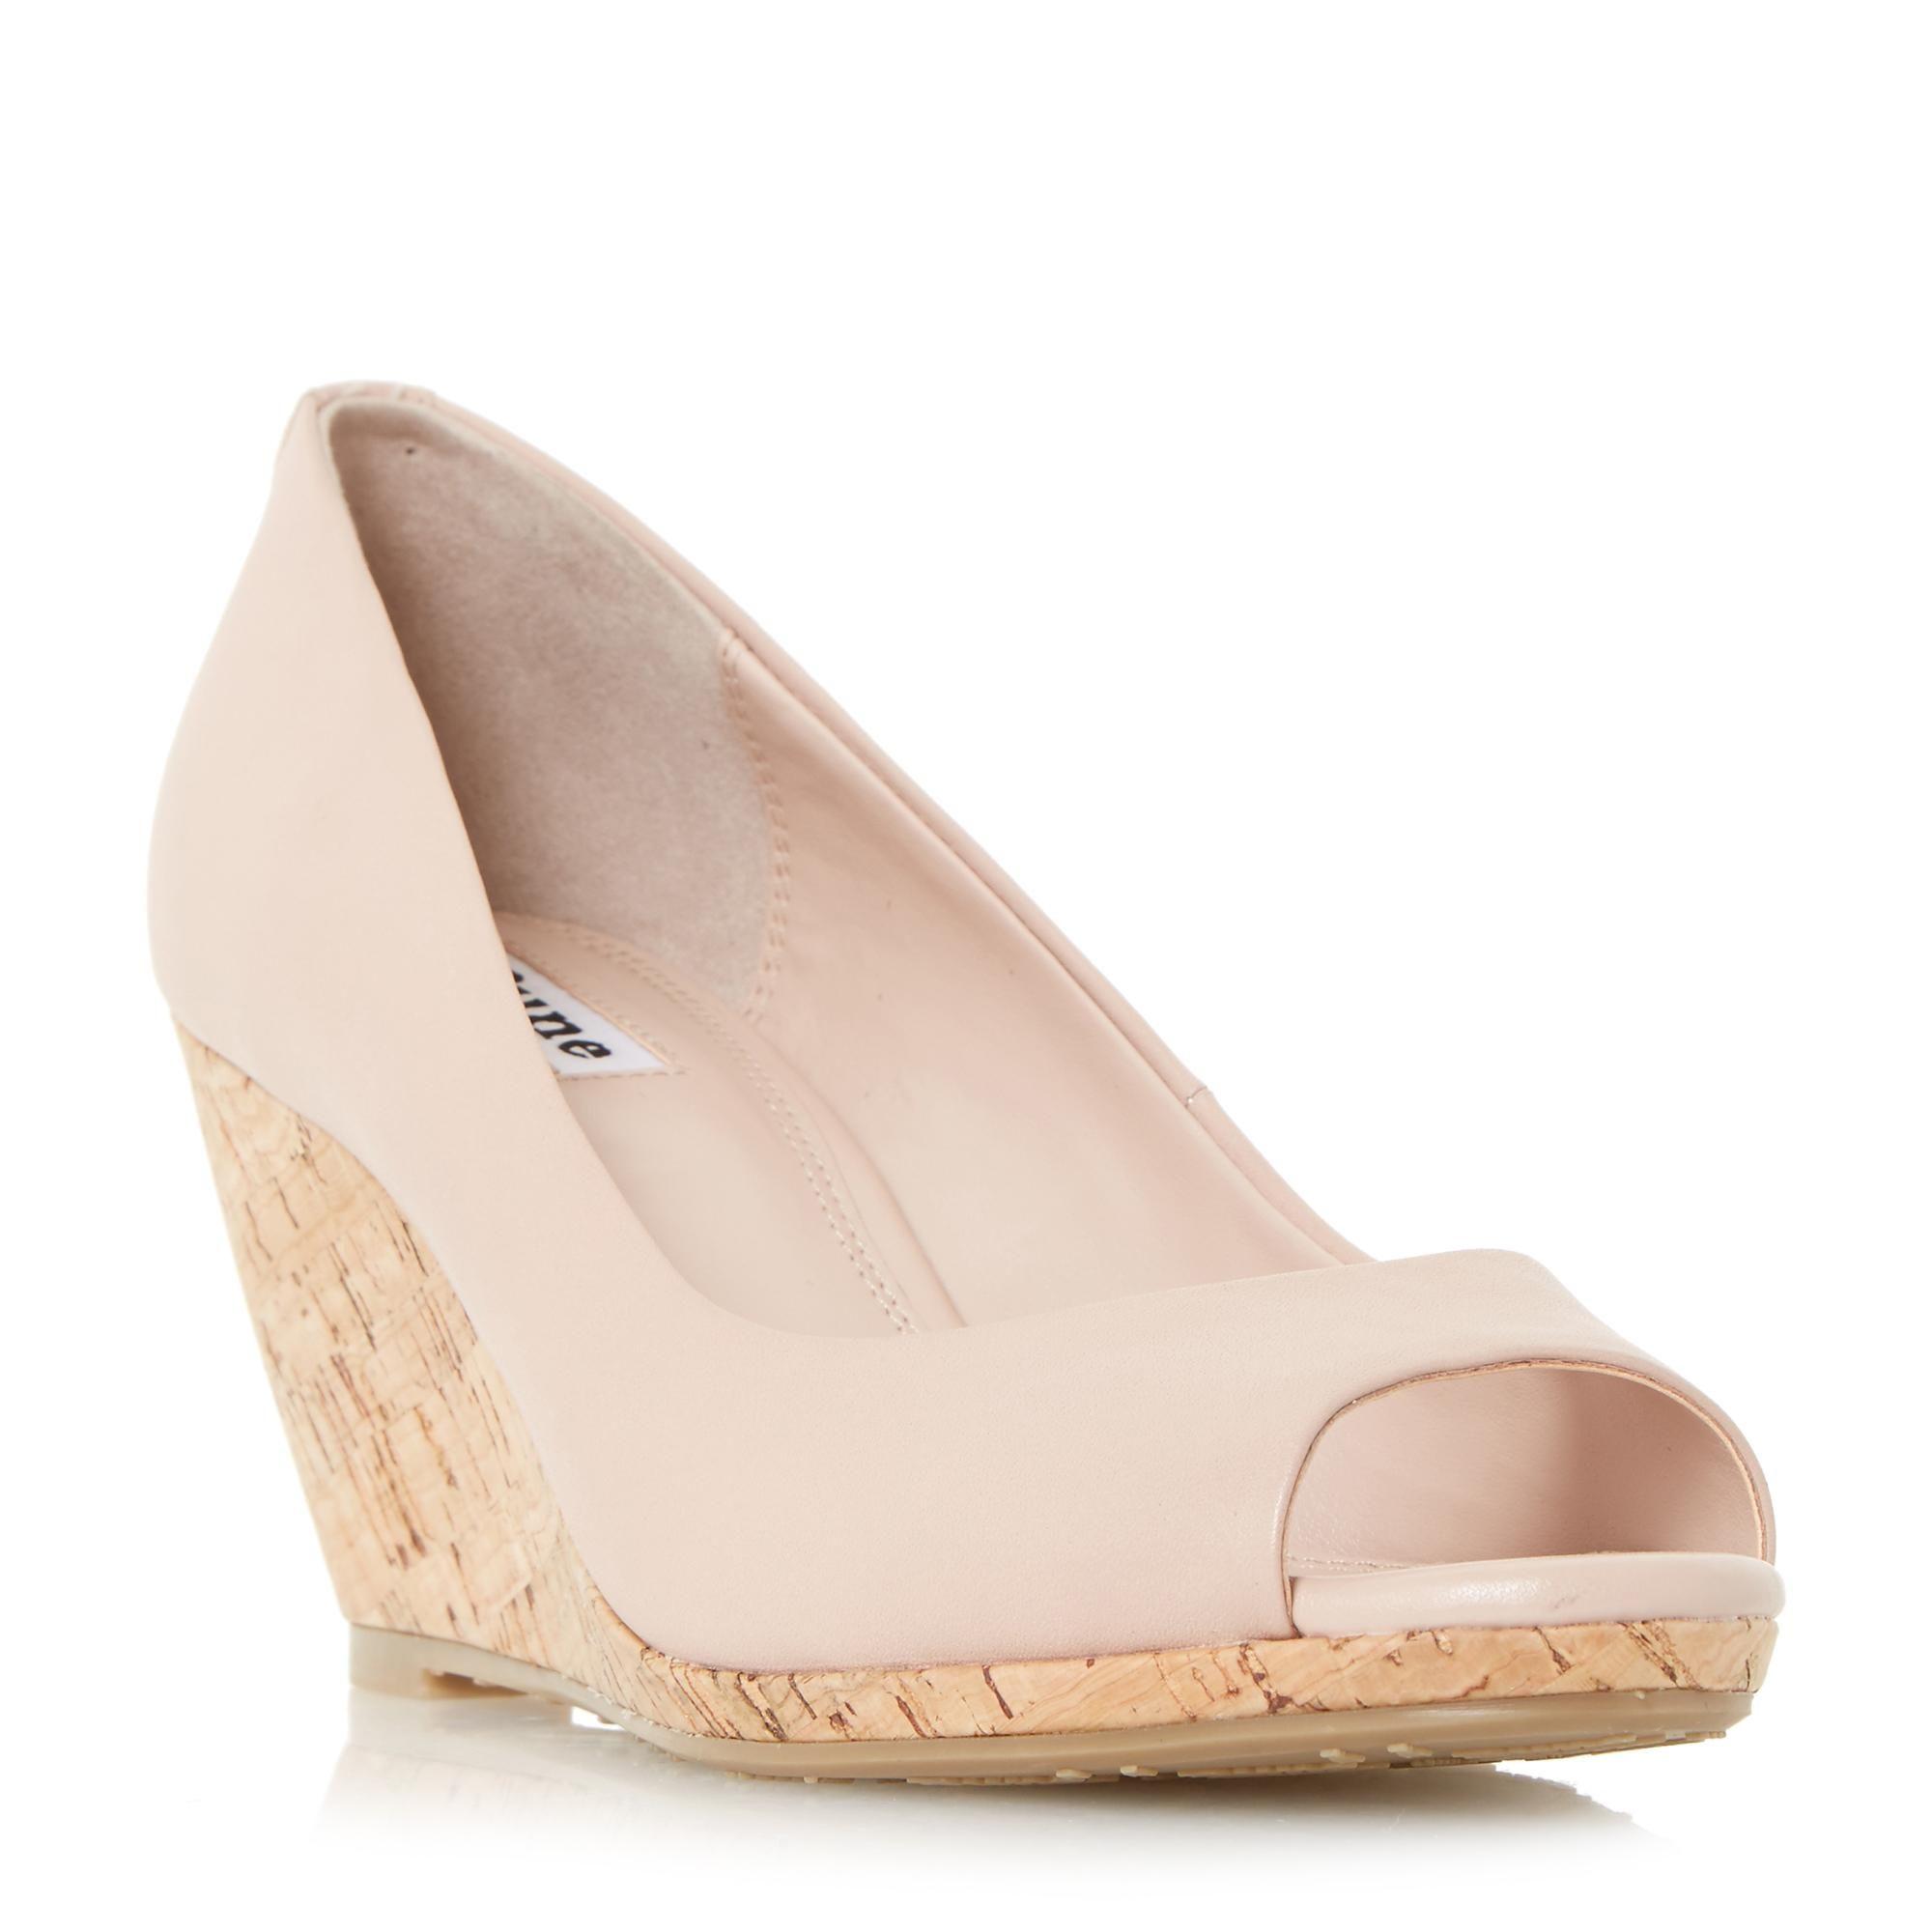 e6ffba40151 DUNE LADIES CADENCE - Peep Toe Cork Wedge Court Shoe - blush